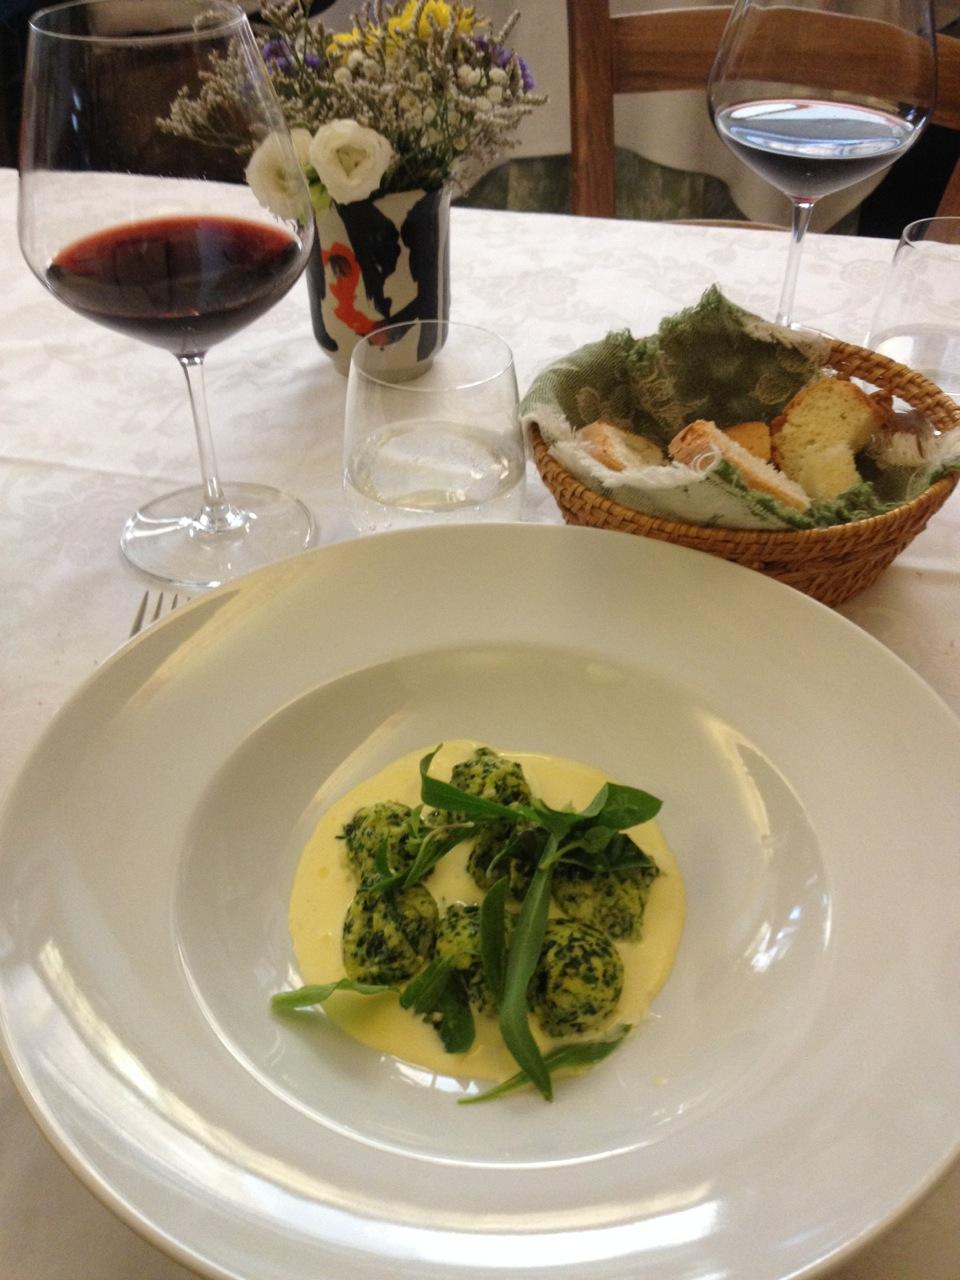 Le Logge: Via del Porrione, 33 em Siena. Fecha aos domingos!